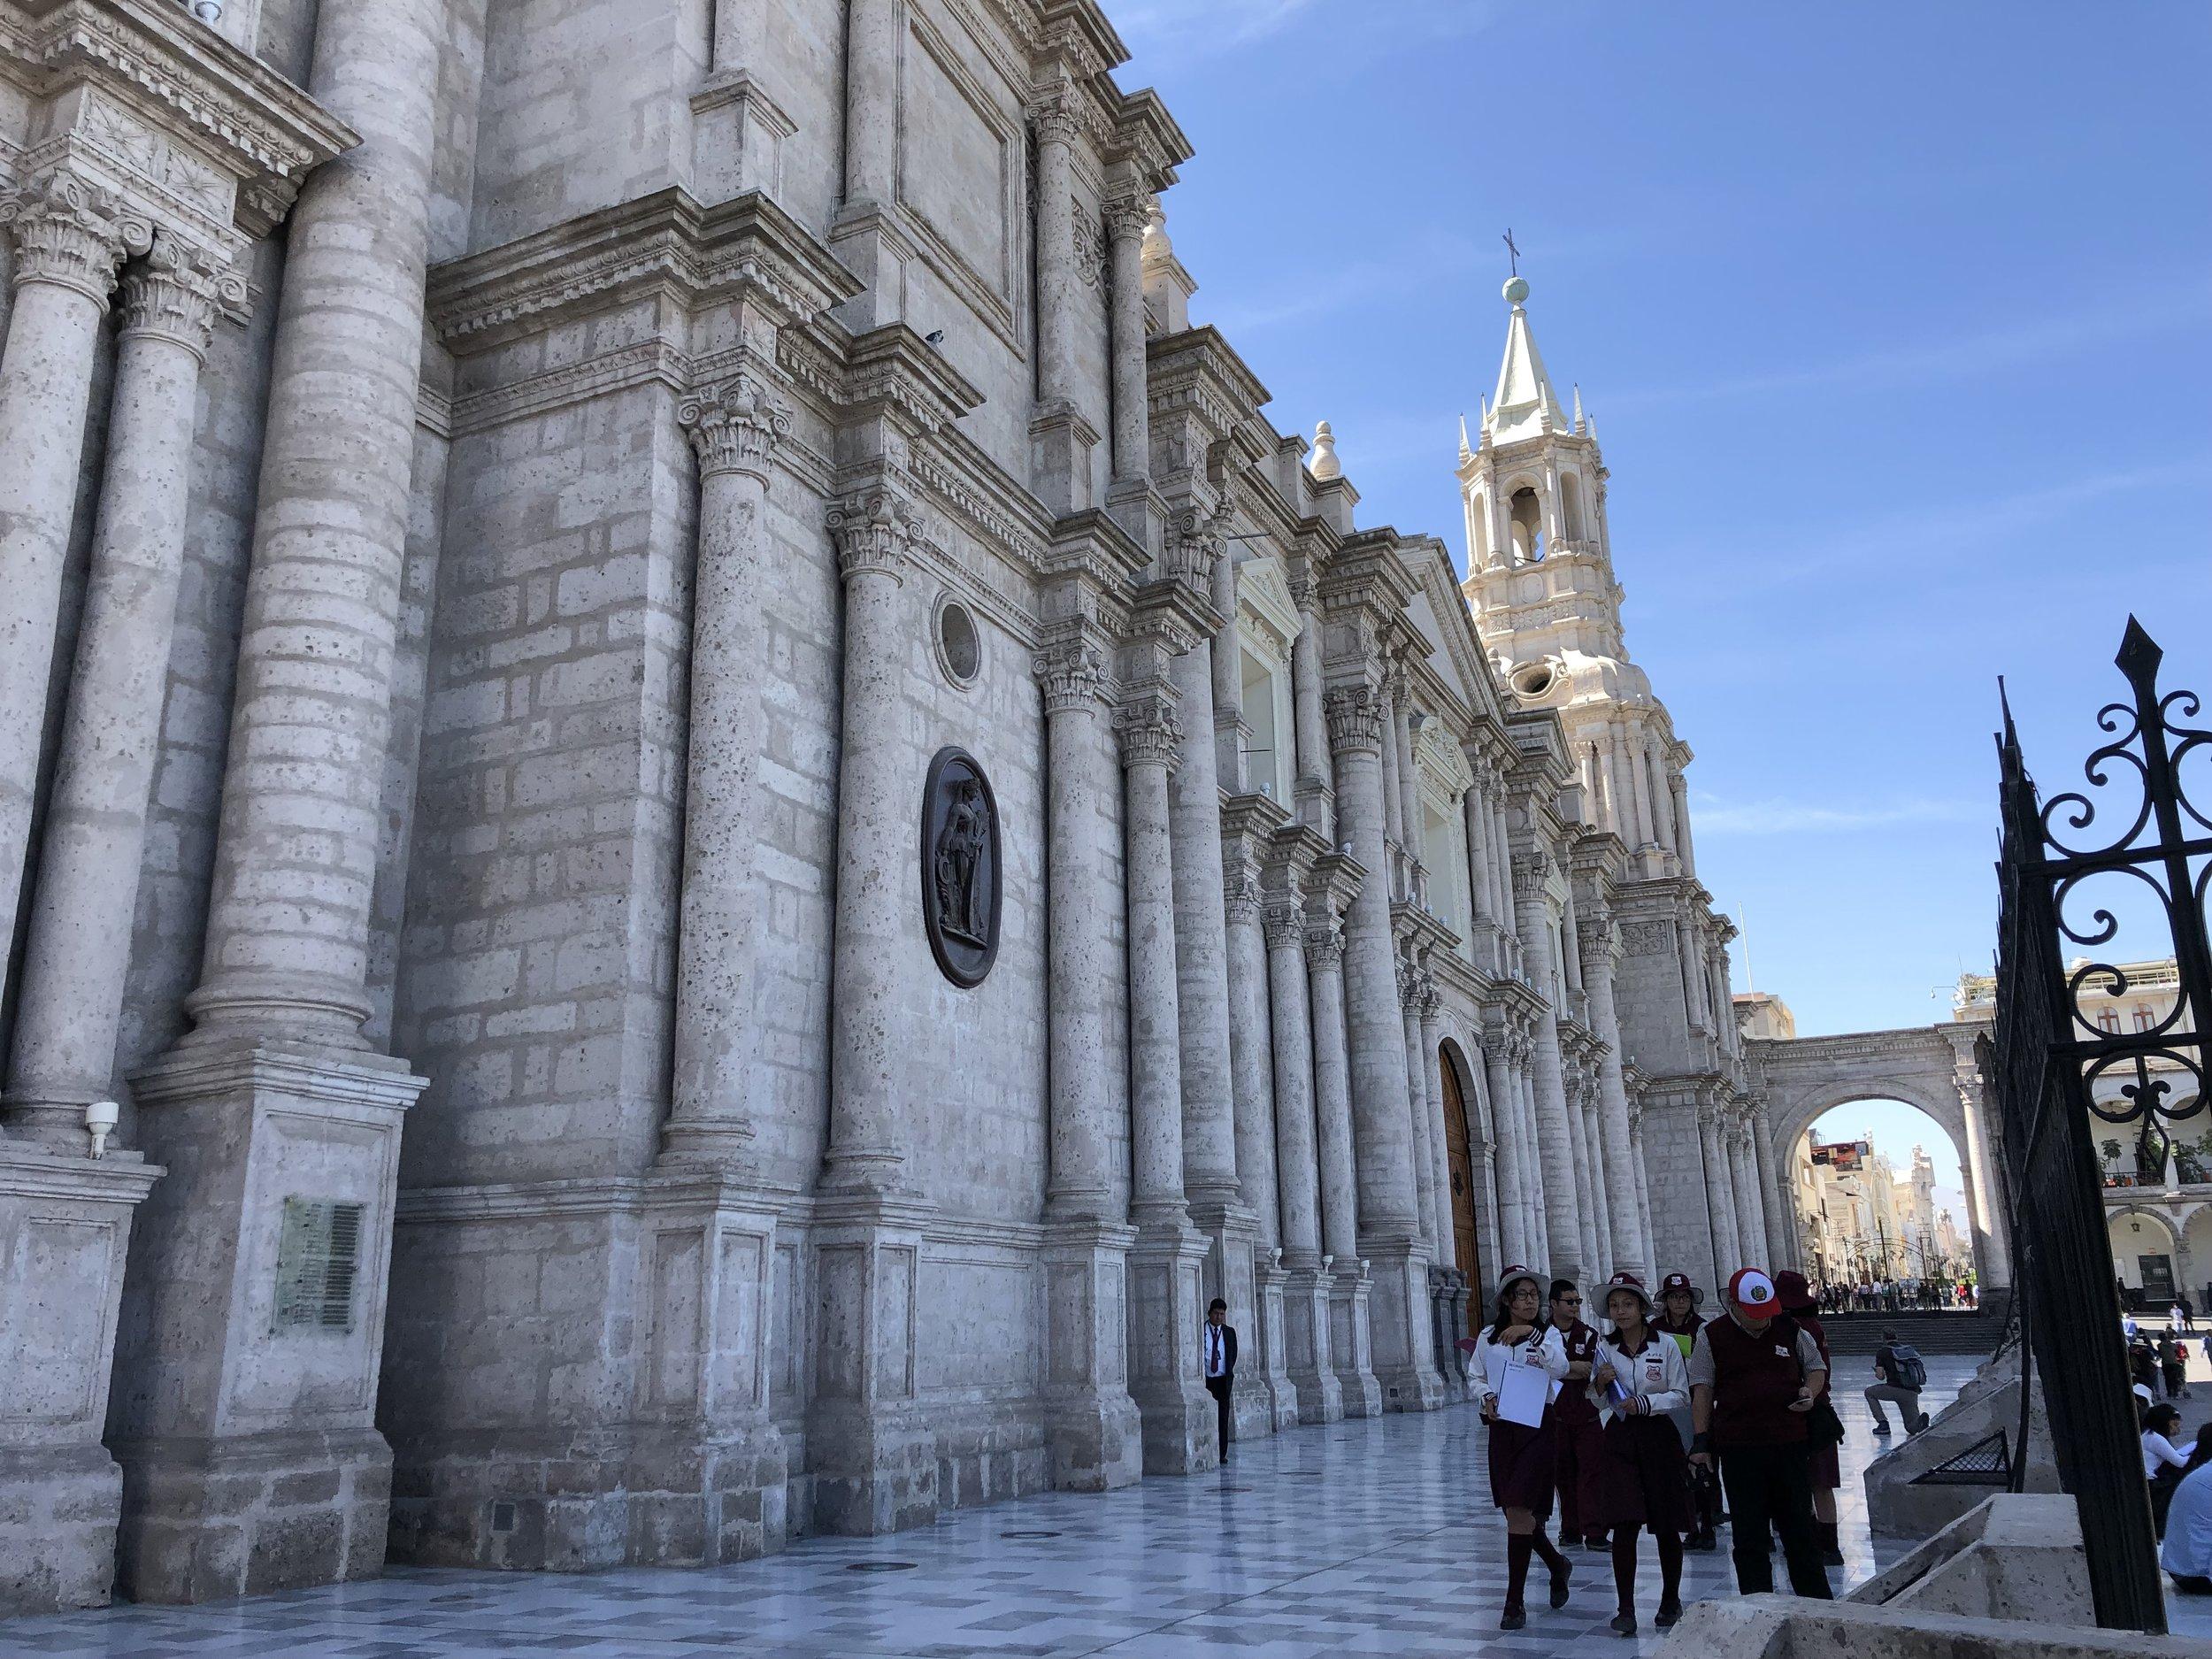 Plaza de Armas - Basilica Cathedral of Arequipa